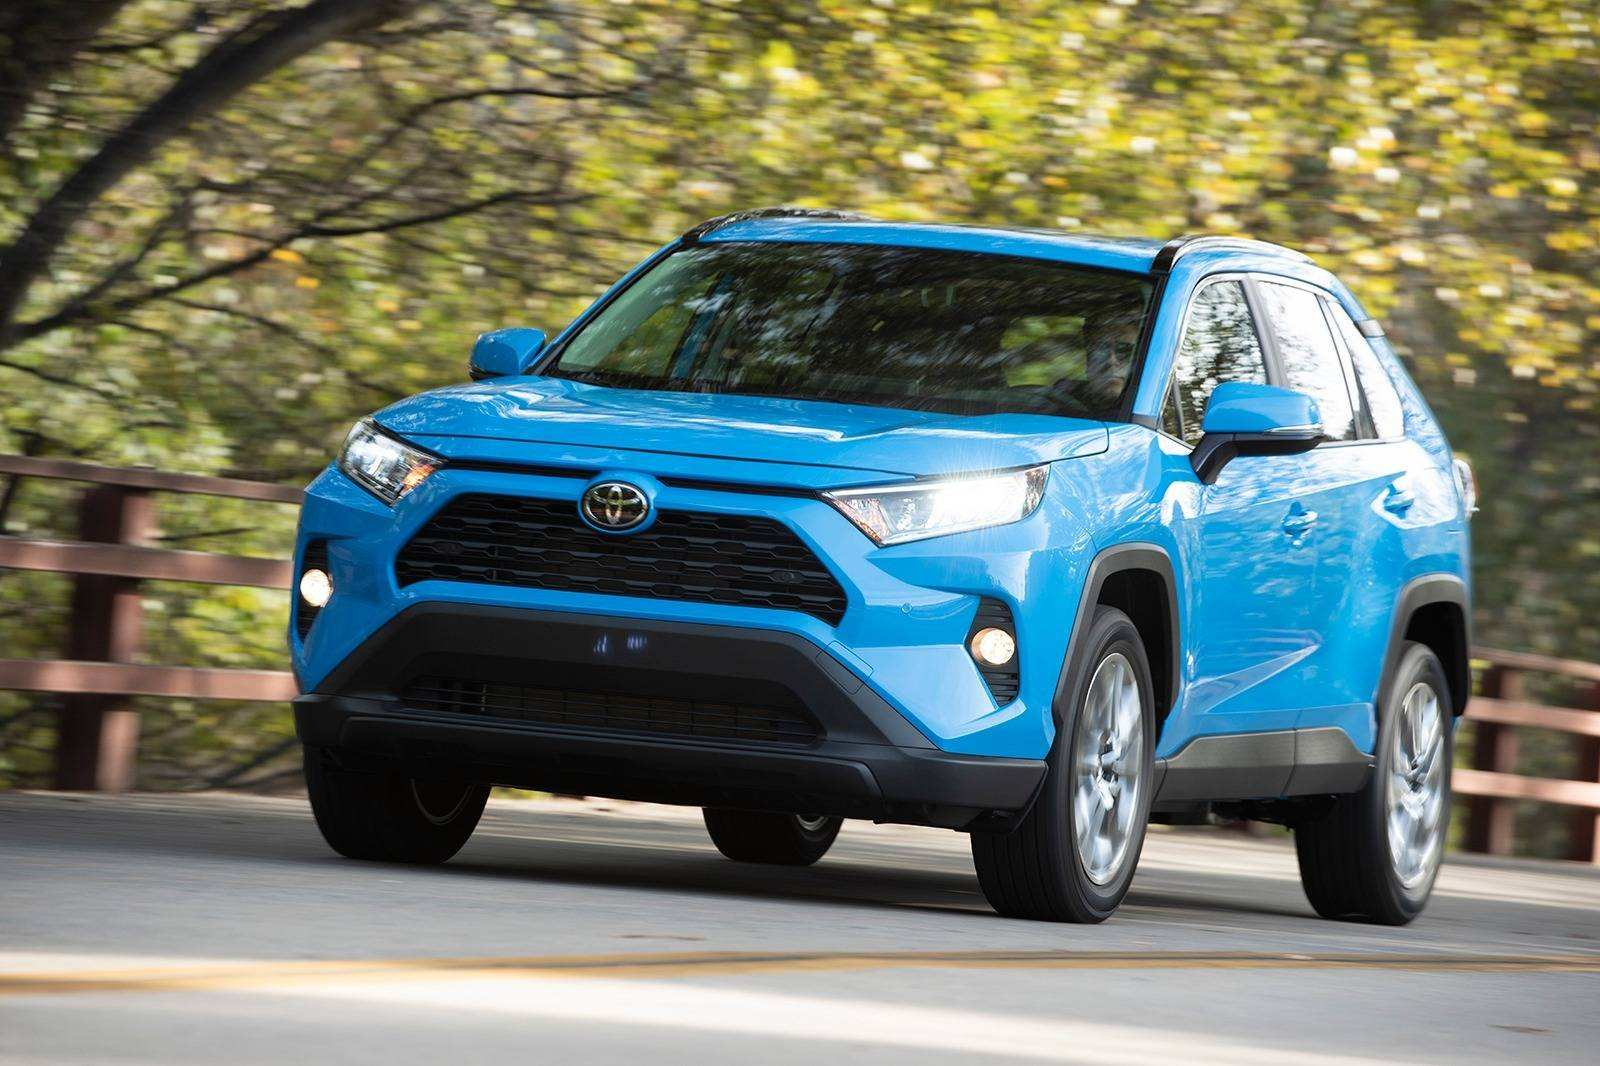 77 Best Review Best Toyota 2019 Rav4 Specs Price Release Date with Best Toyota 2019 Rav4 Specs Price